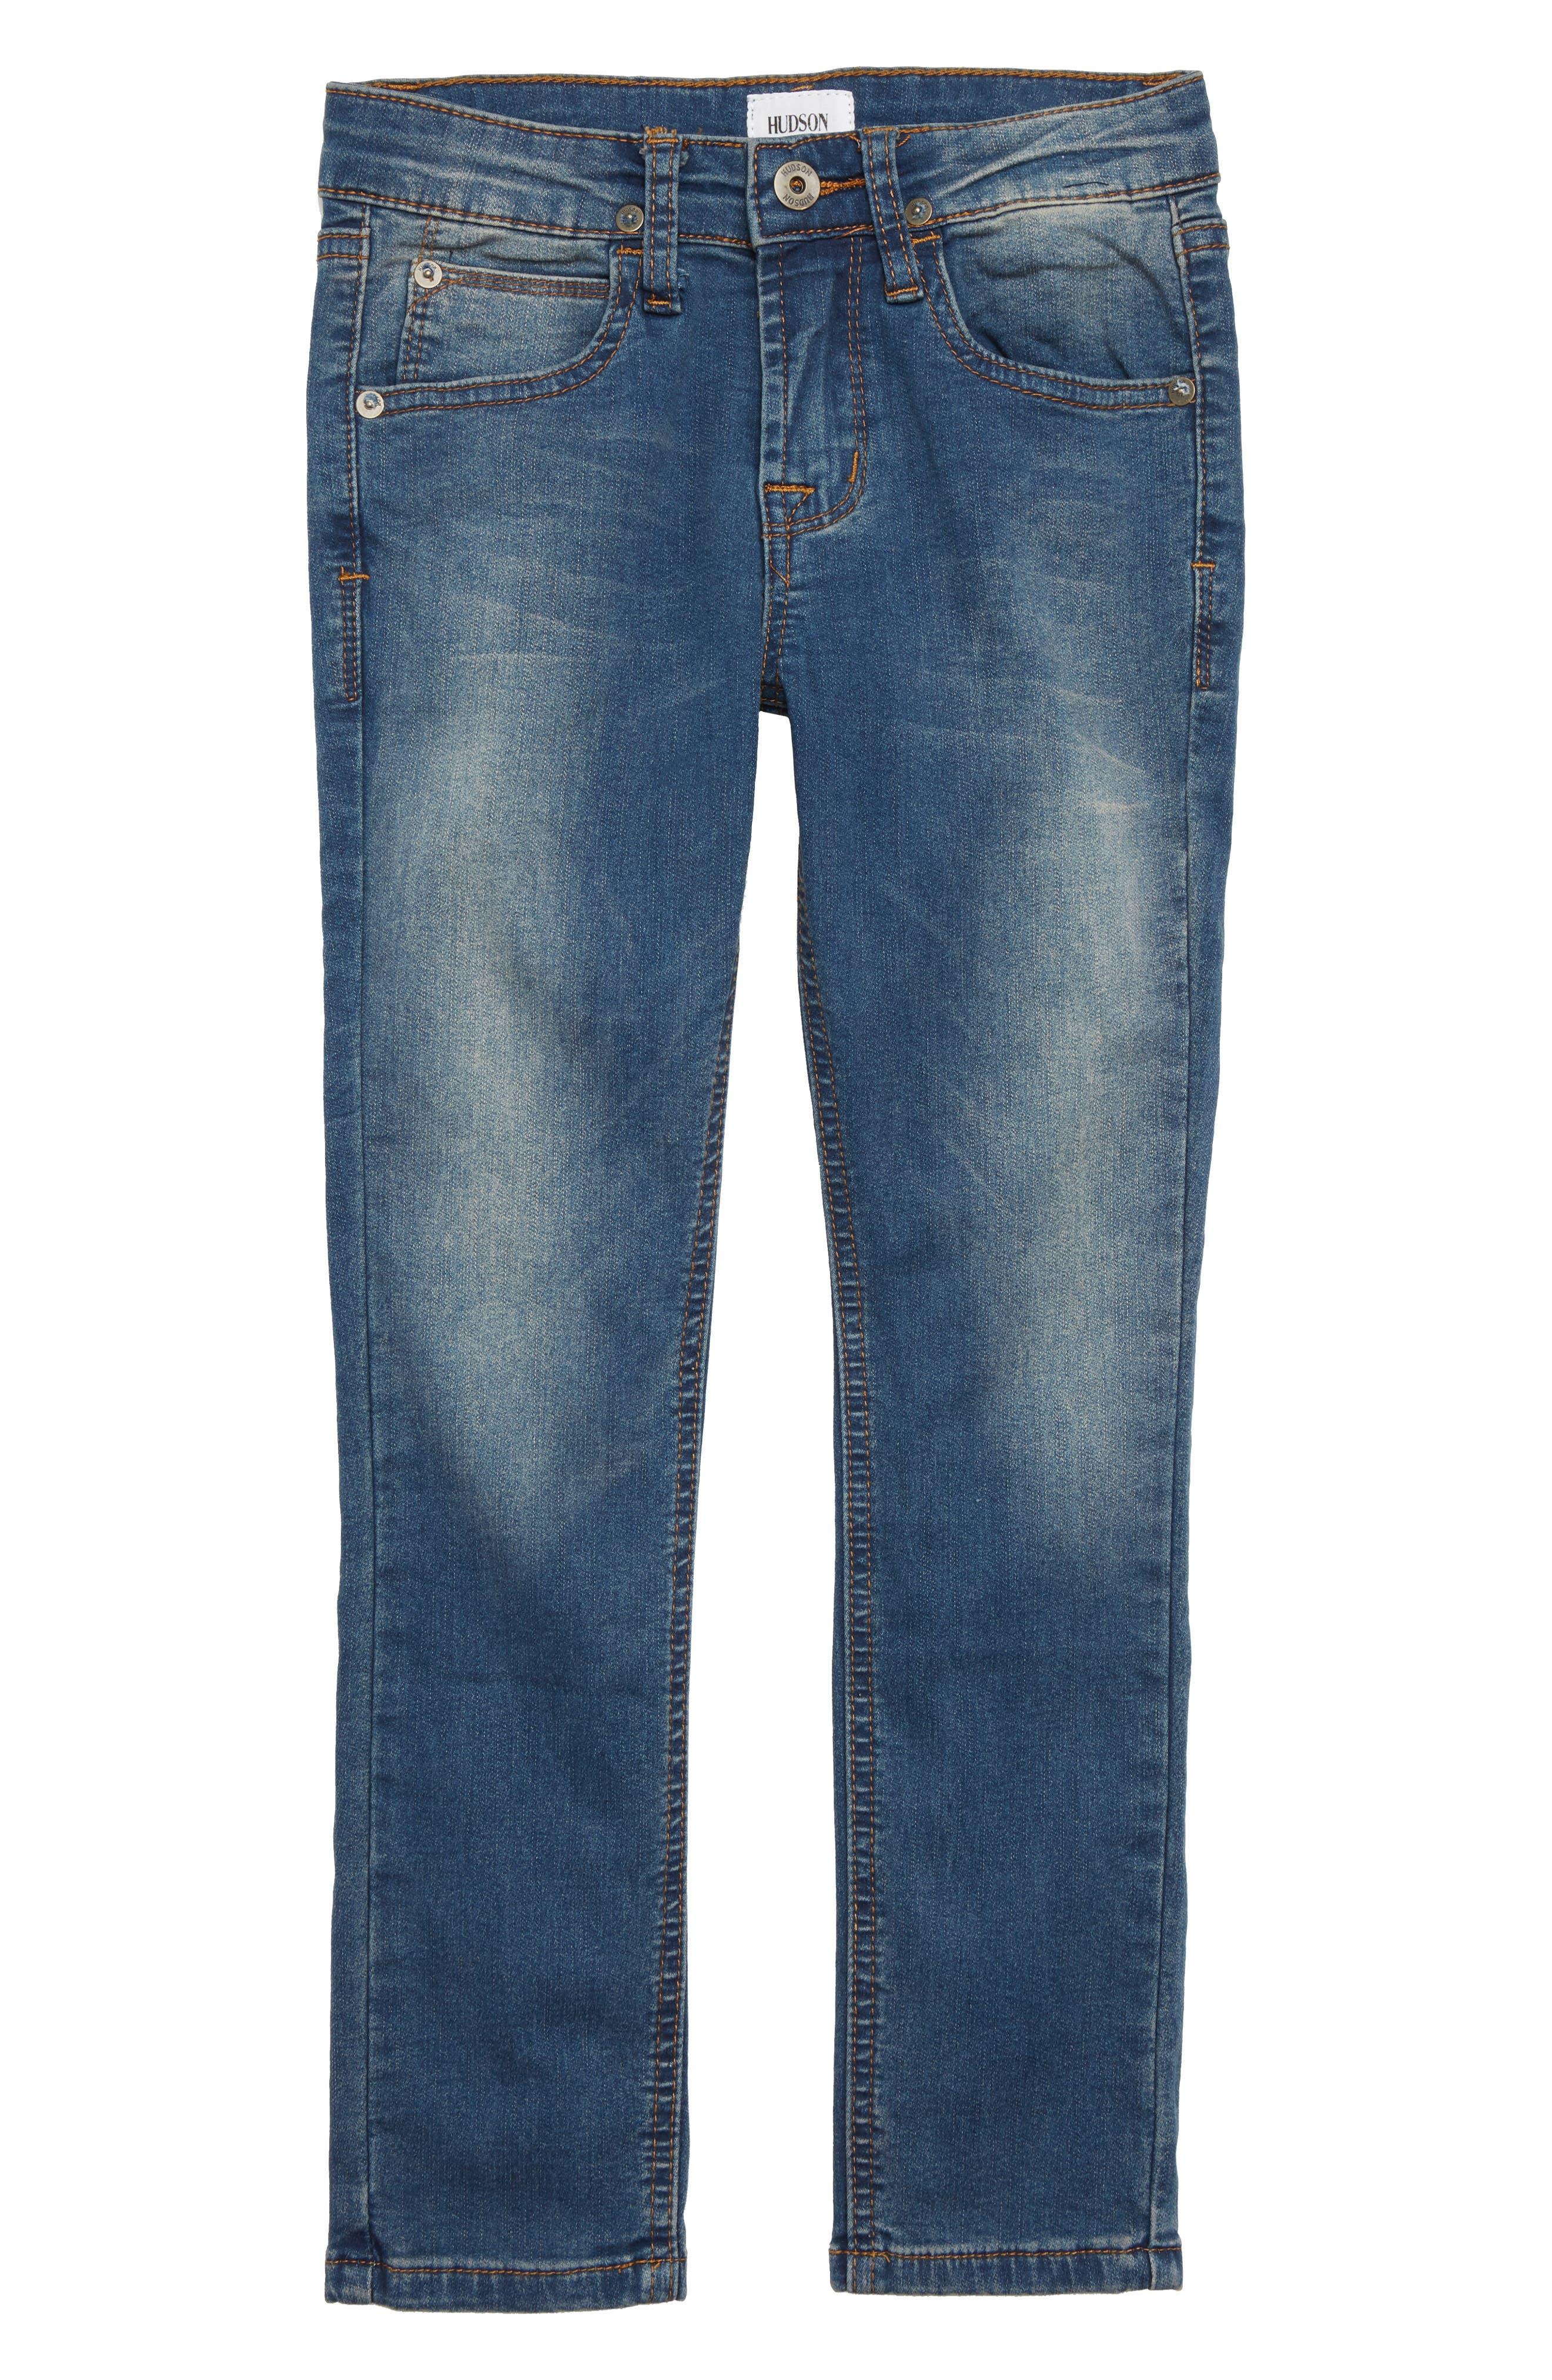 HUDSON KIDS,                             Jagger Slim Fit Straight Leg Jeans,                             Main thumbnail 1, color,                             458